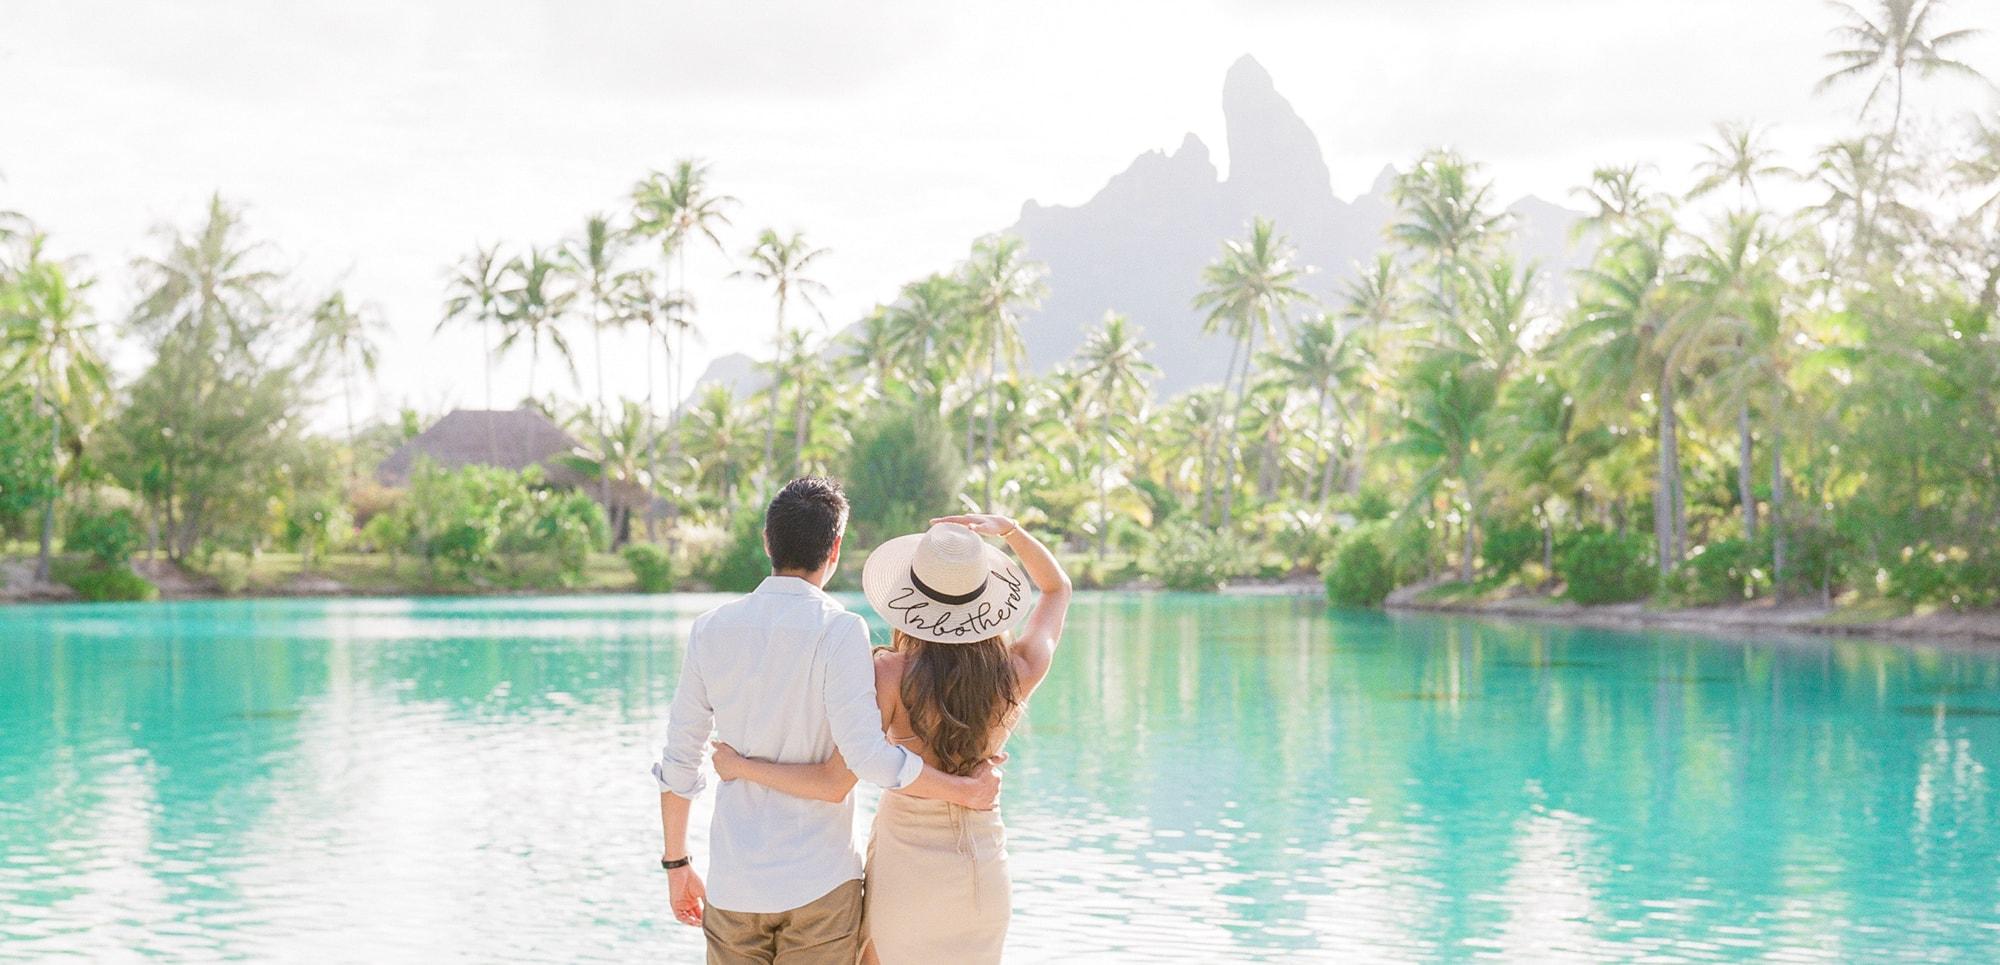 https://tahititourisme.mx/wp-content/uploads/2021/04/PCP-Bora-Bora-Photographer-St-Regis-Honeymoon.jpg